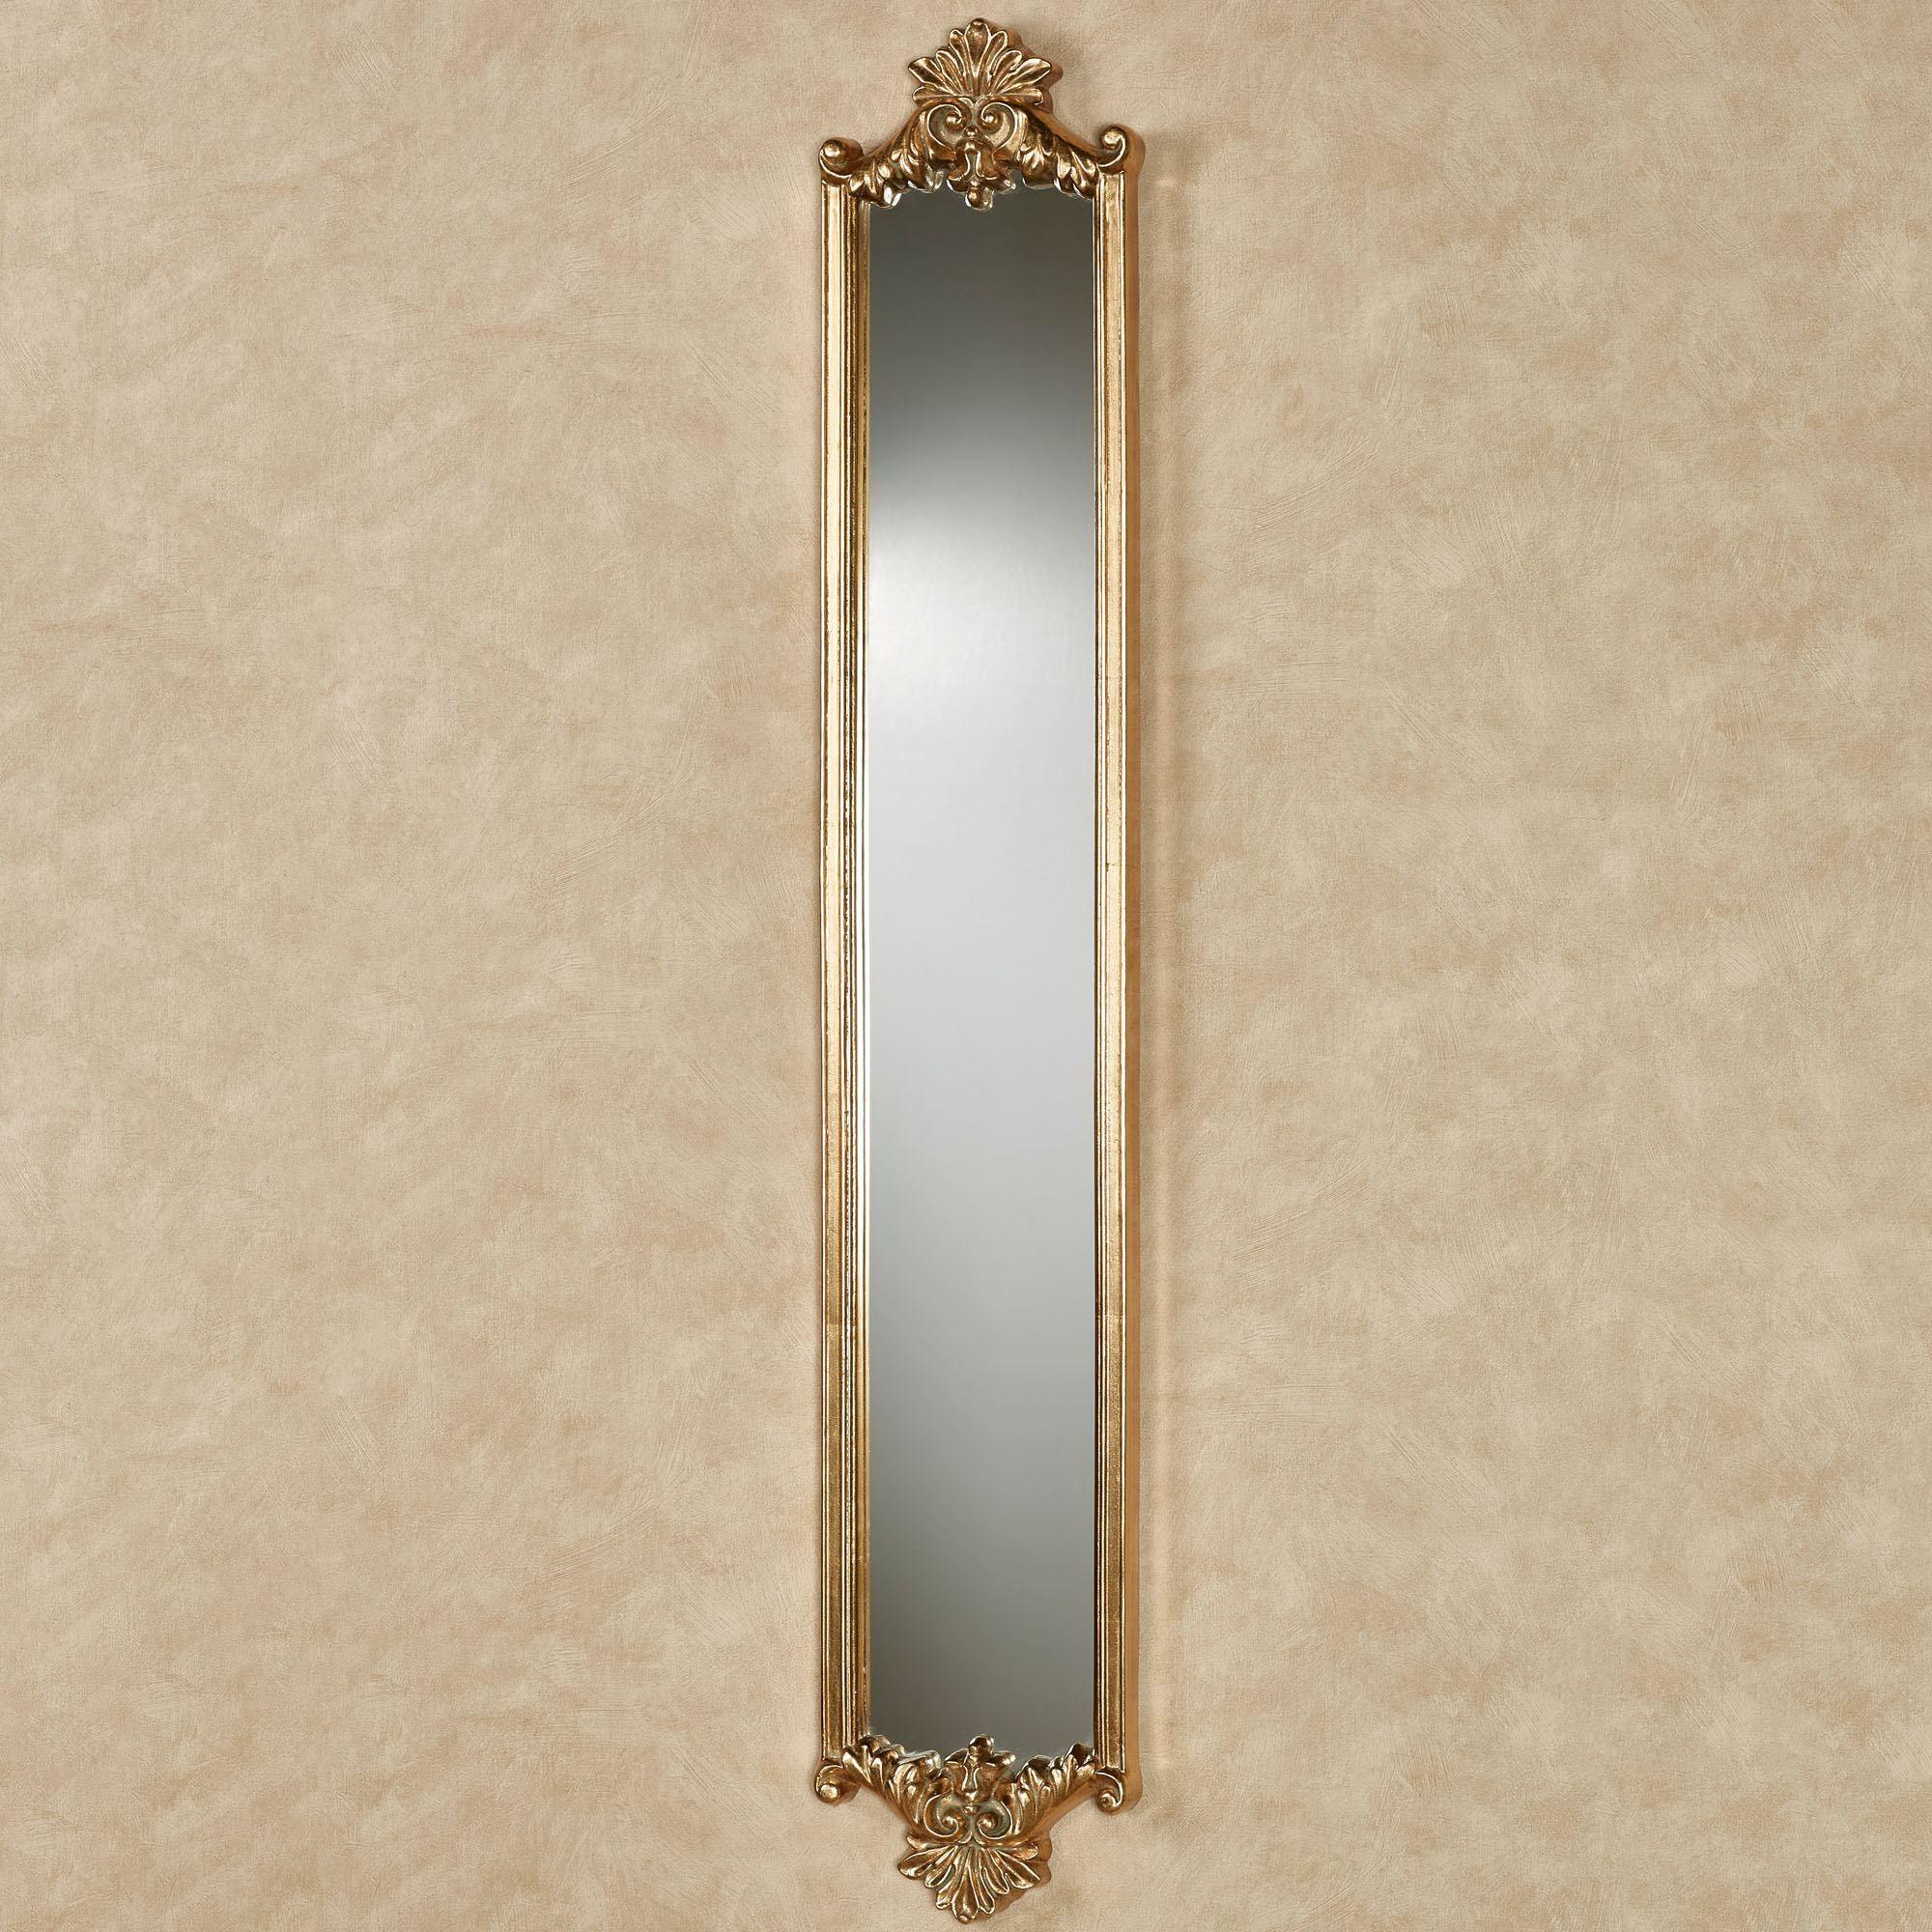 Alistair Gold Leaf Wall Mirror Panel